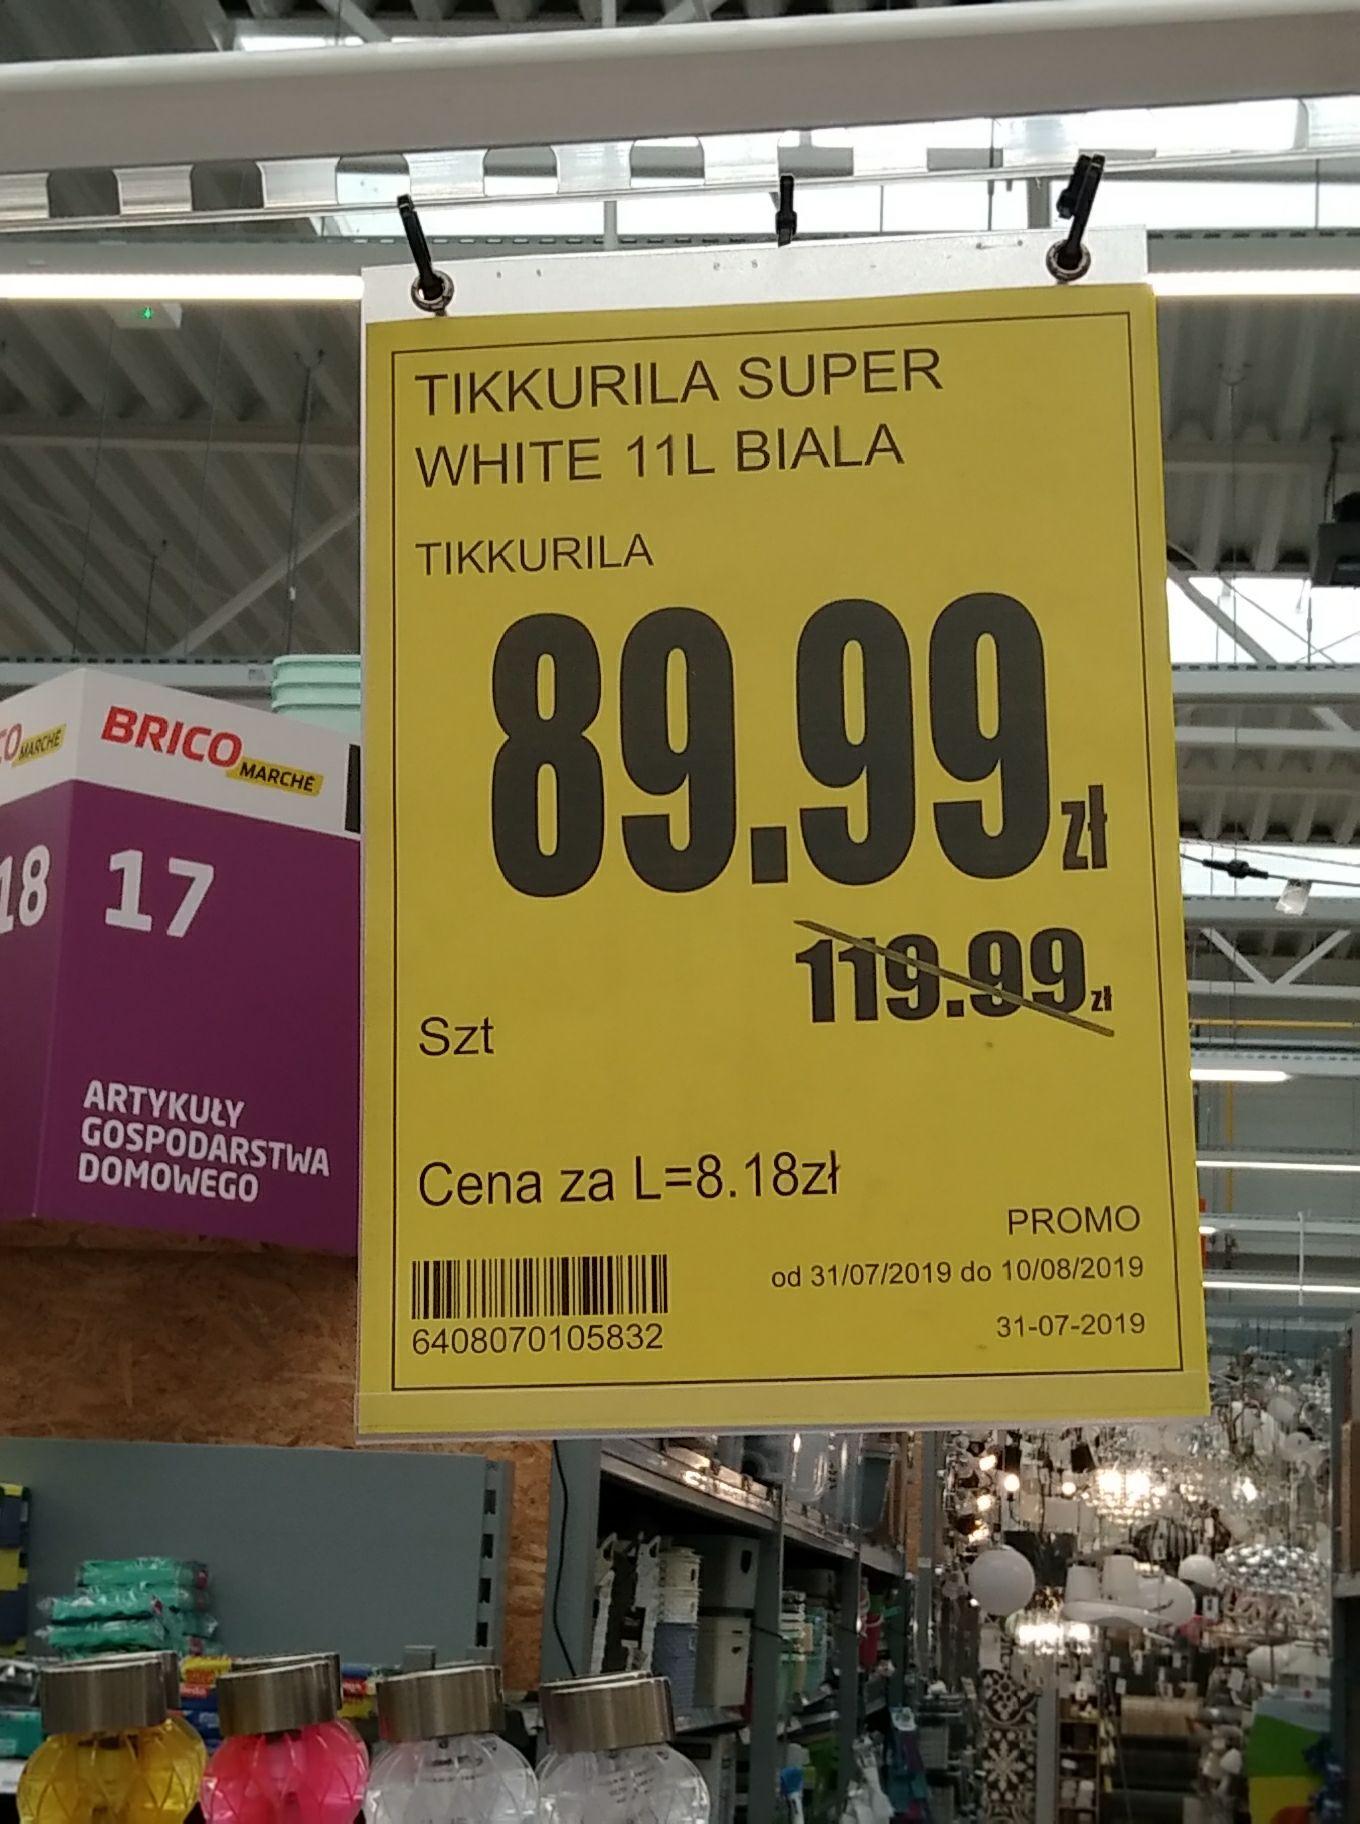 Farba lateksowa Tikkurilla Super White 11 l w Bricomarche